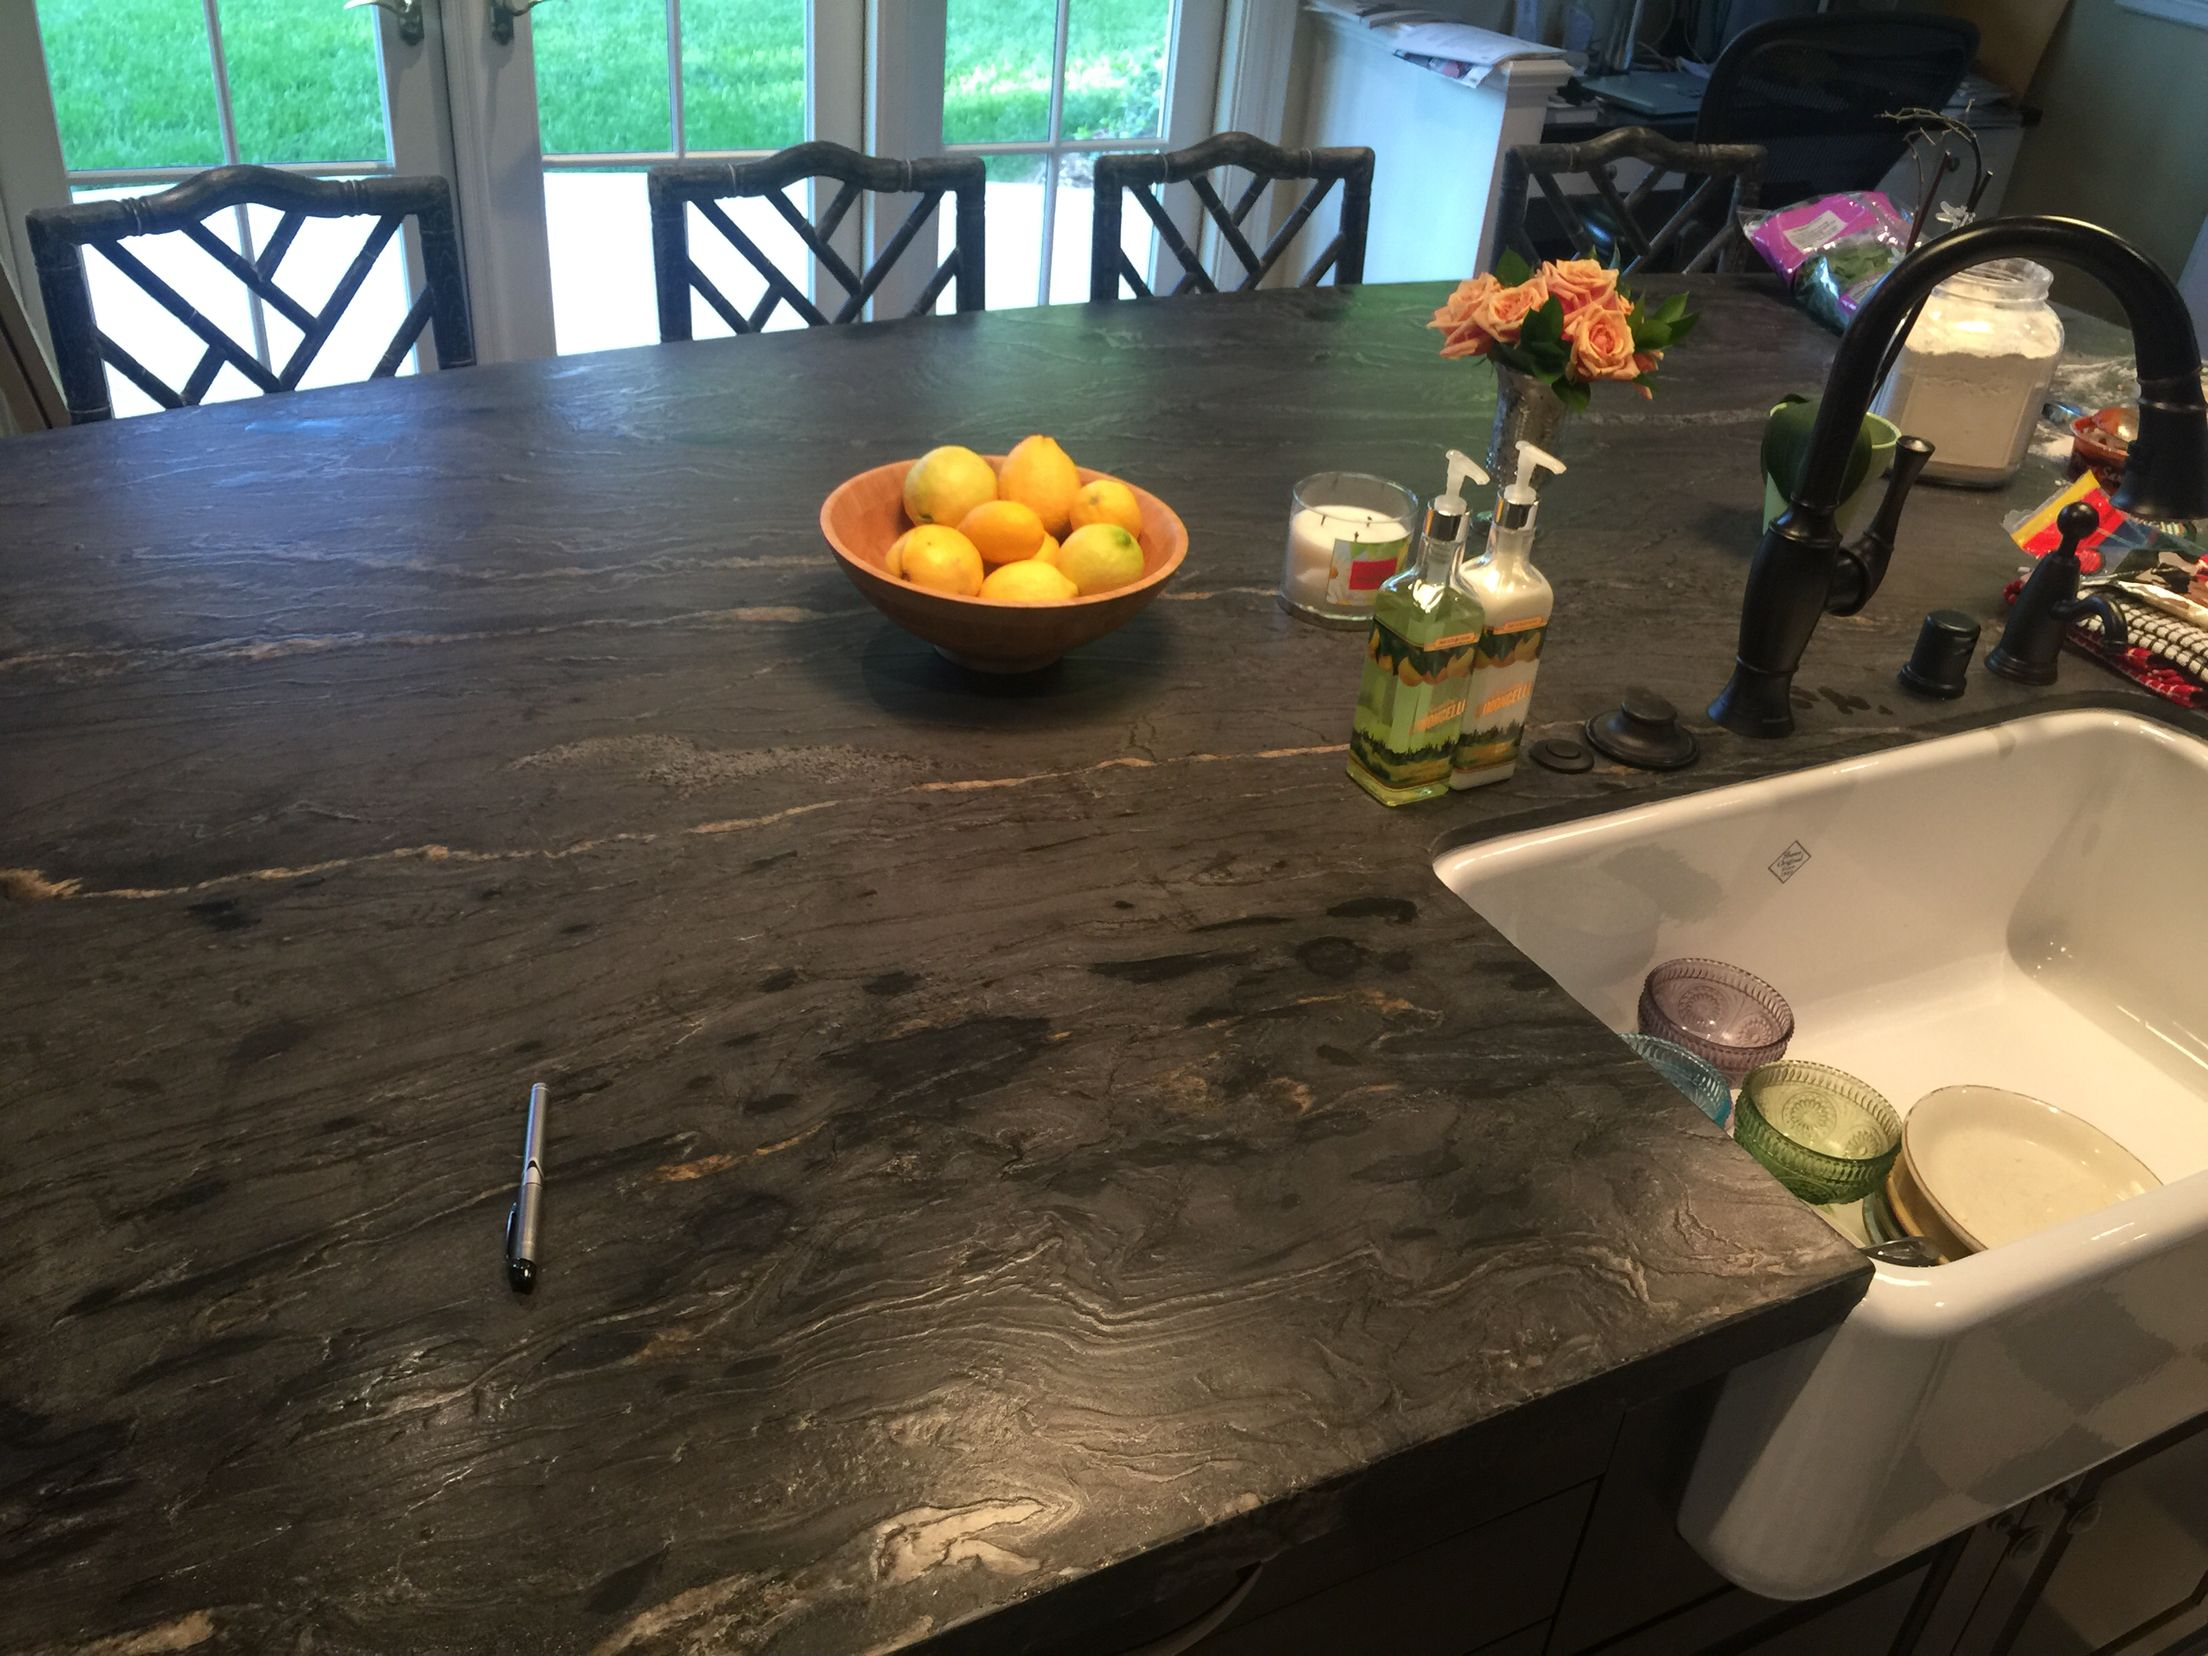 Titanium Granite Kitchen Titanium Granite Kitchen This Dramatic Granite Looks Stunning In